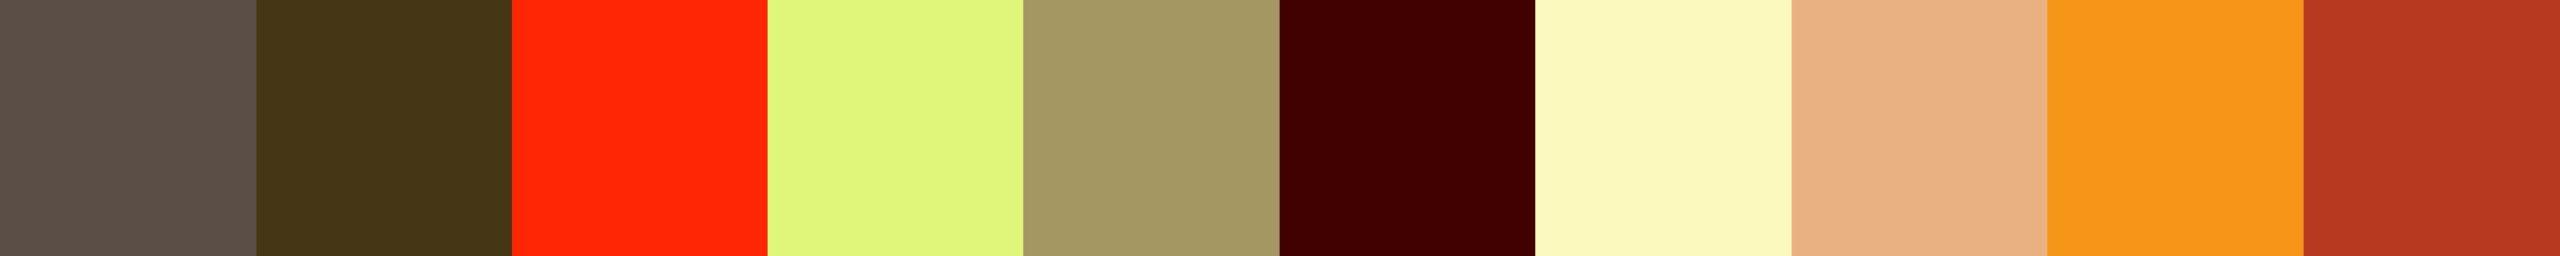 553 Gaelic Color Palette